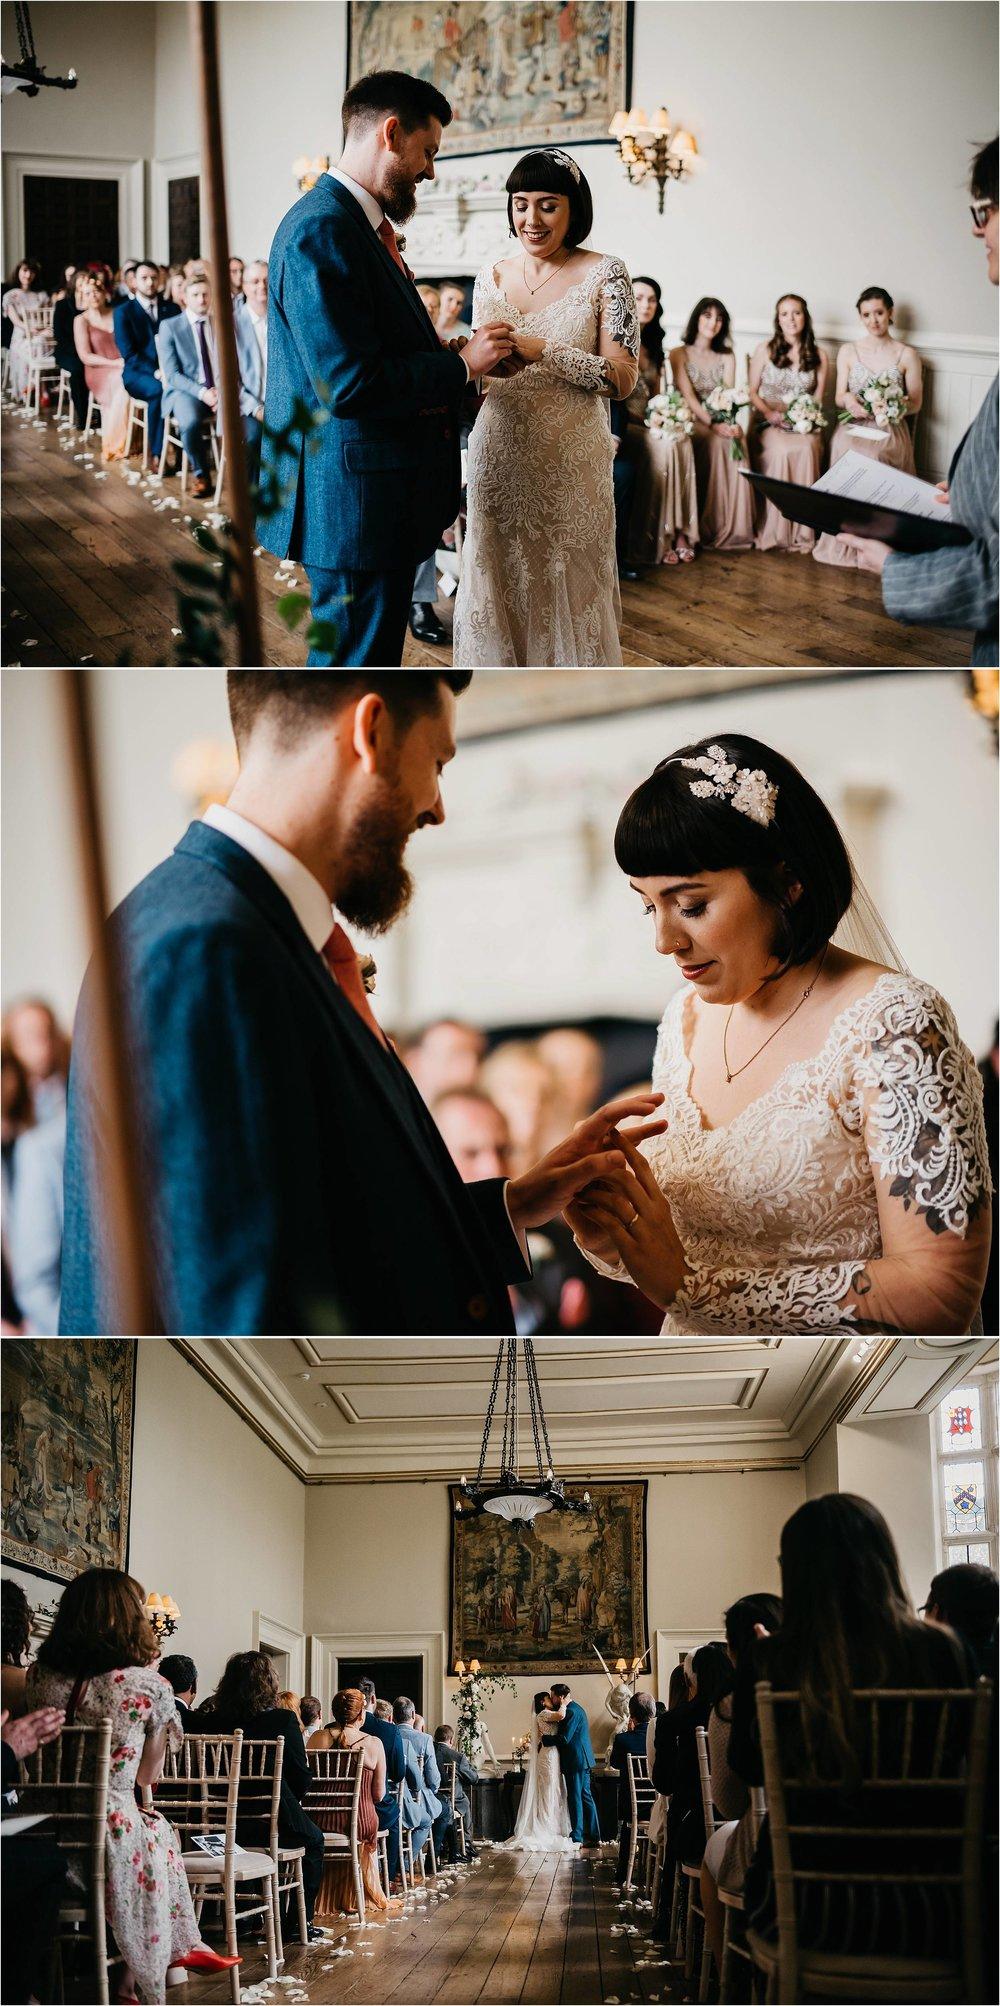 Elmore Court Wedding Photography_0068.jpg